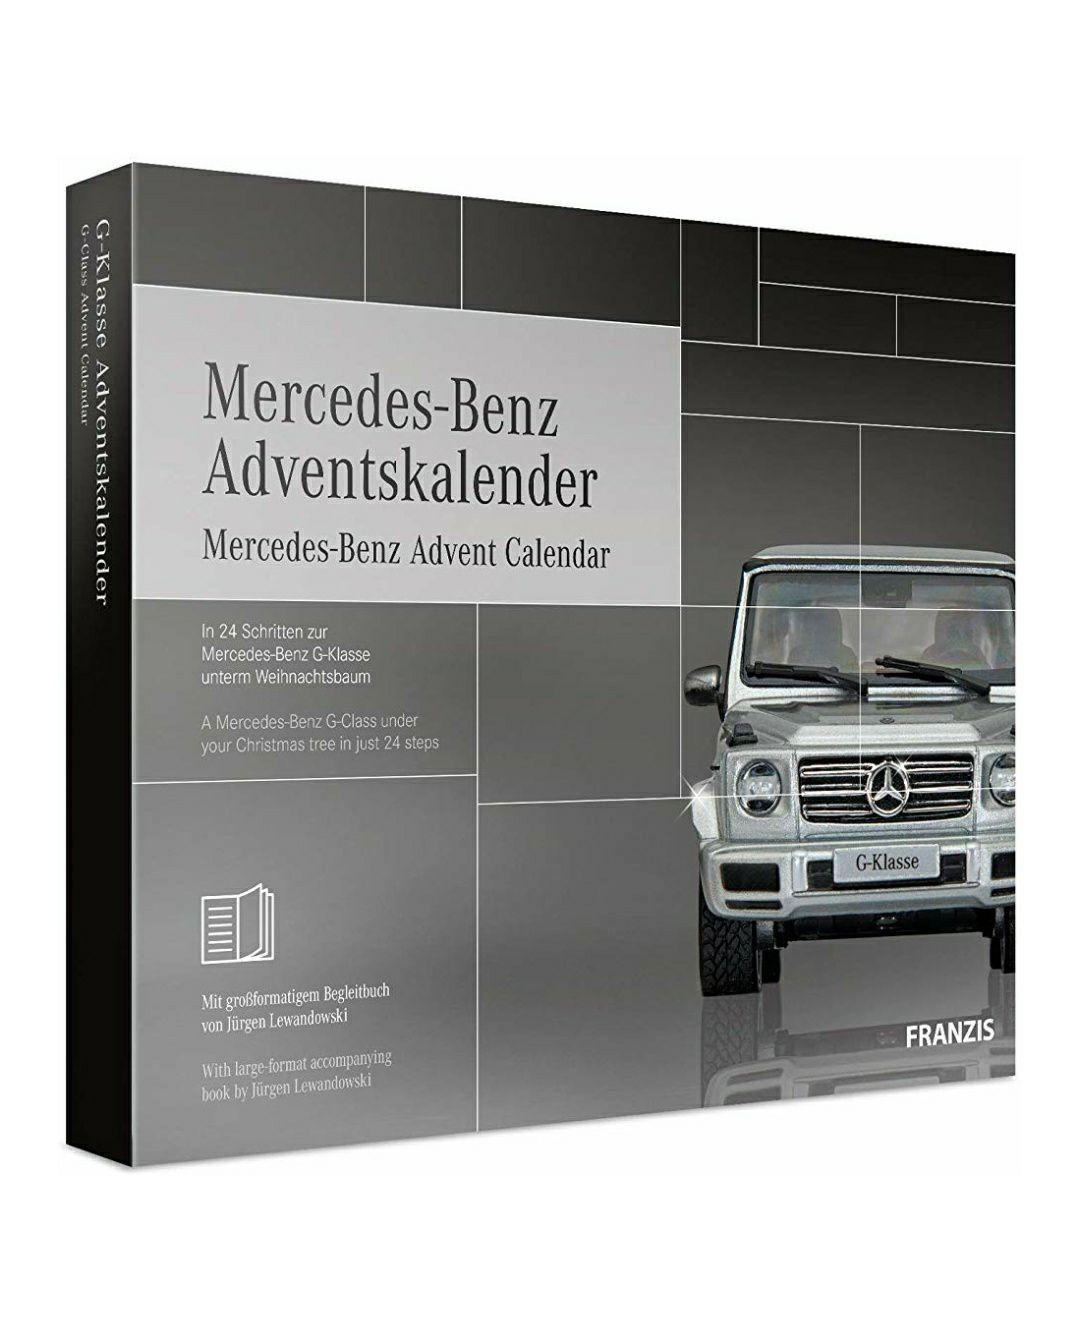 Mercedes Benz Adventskalender